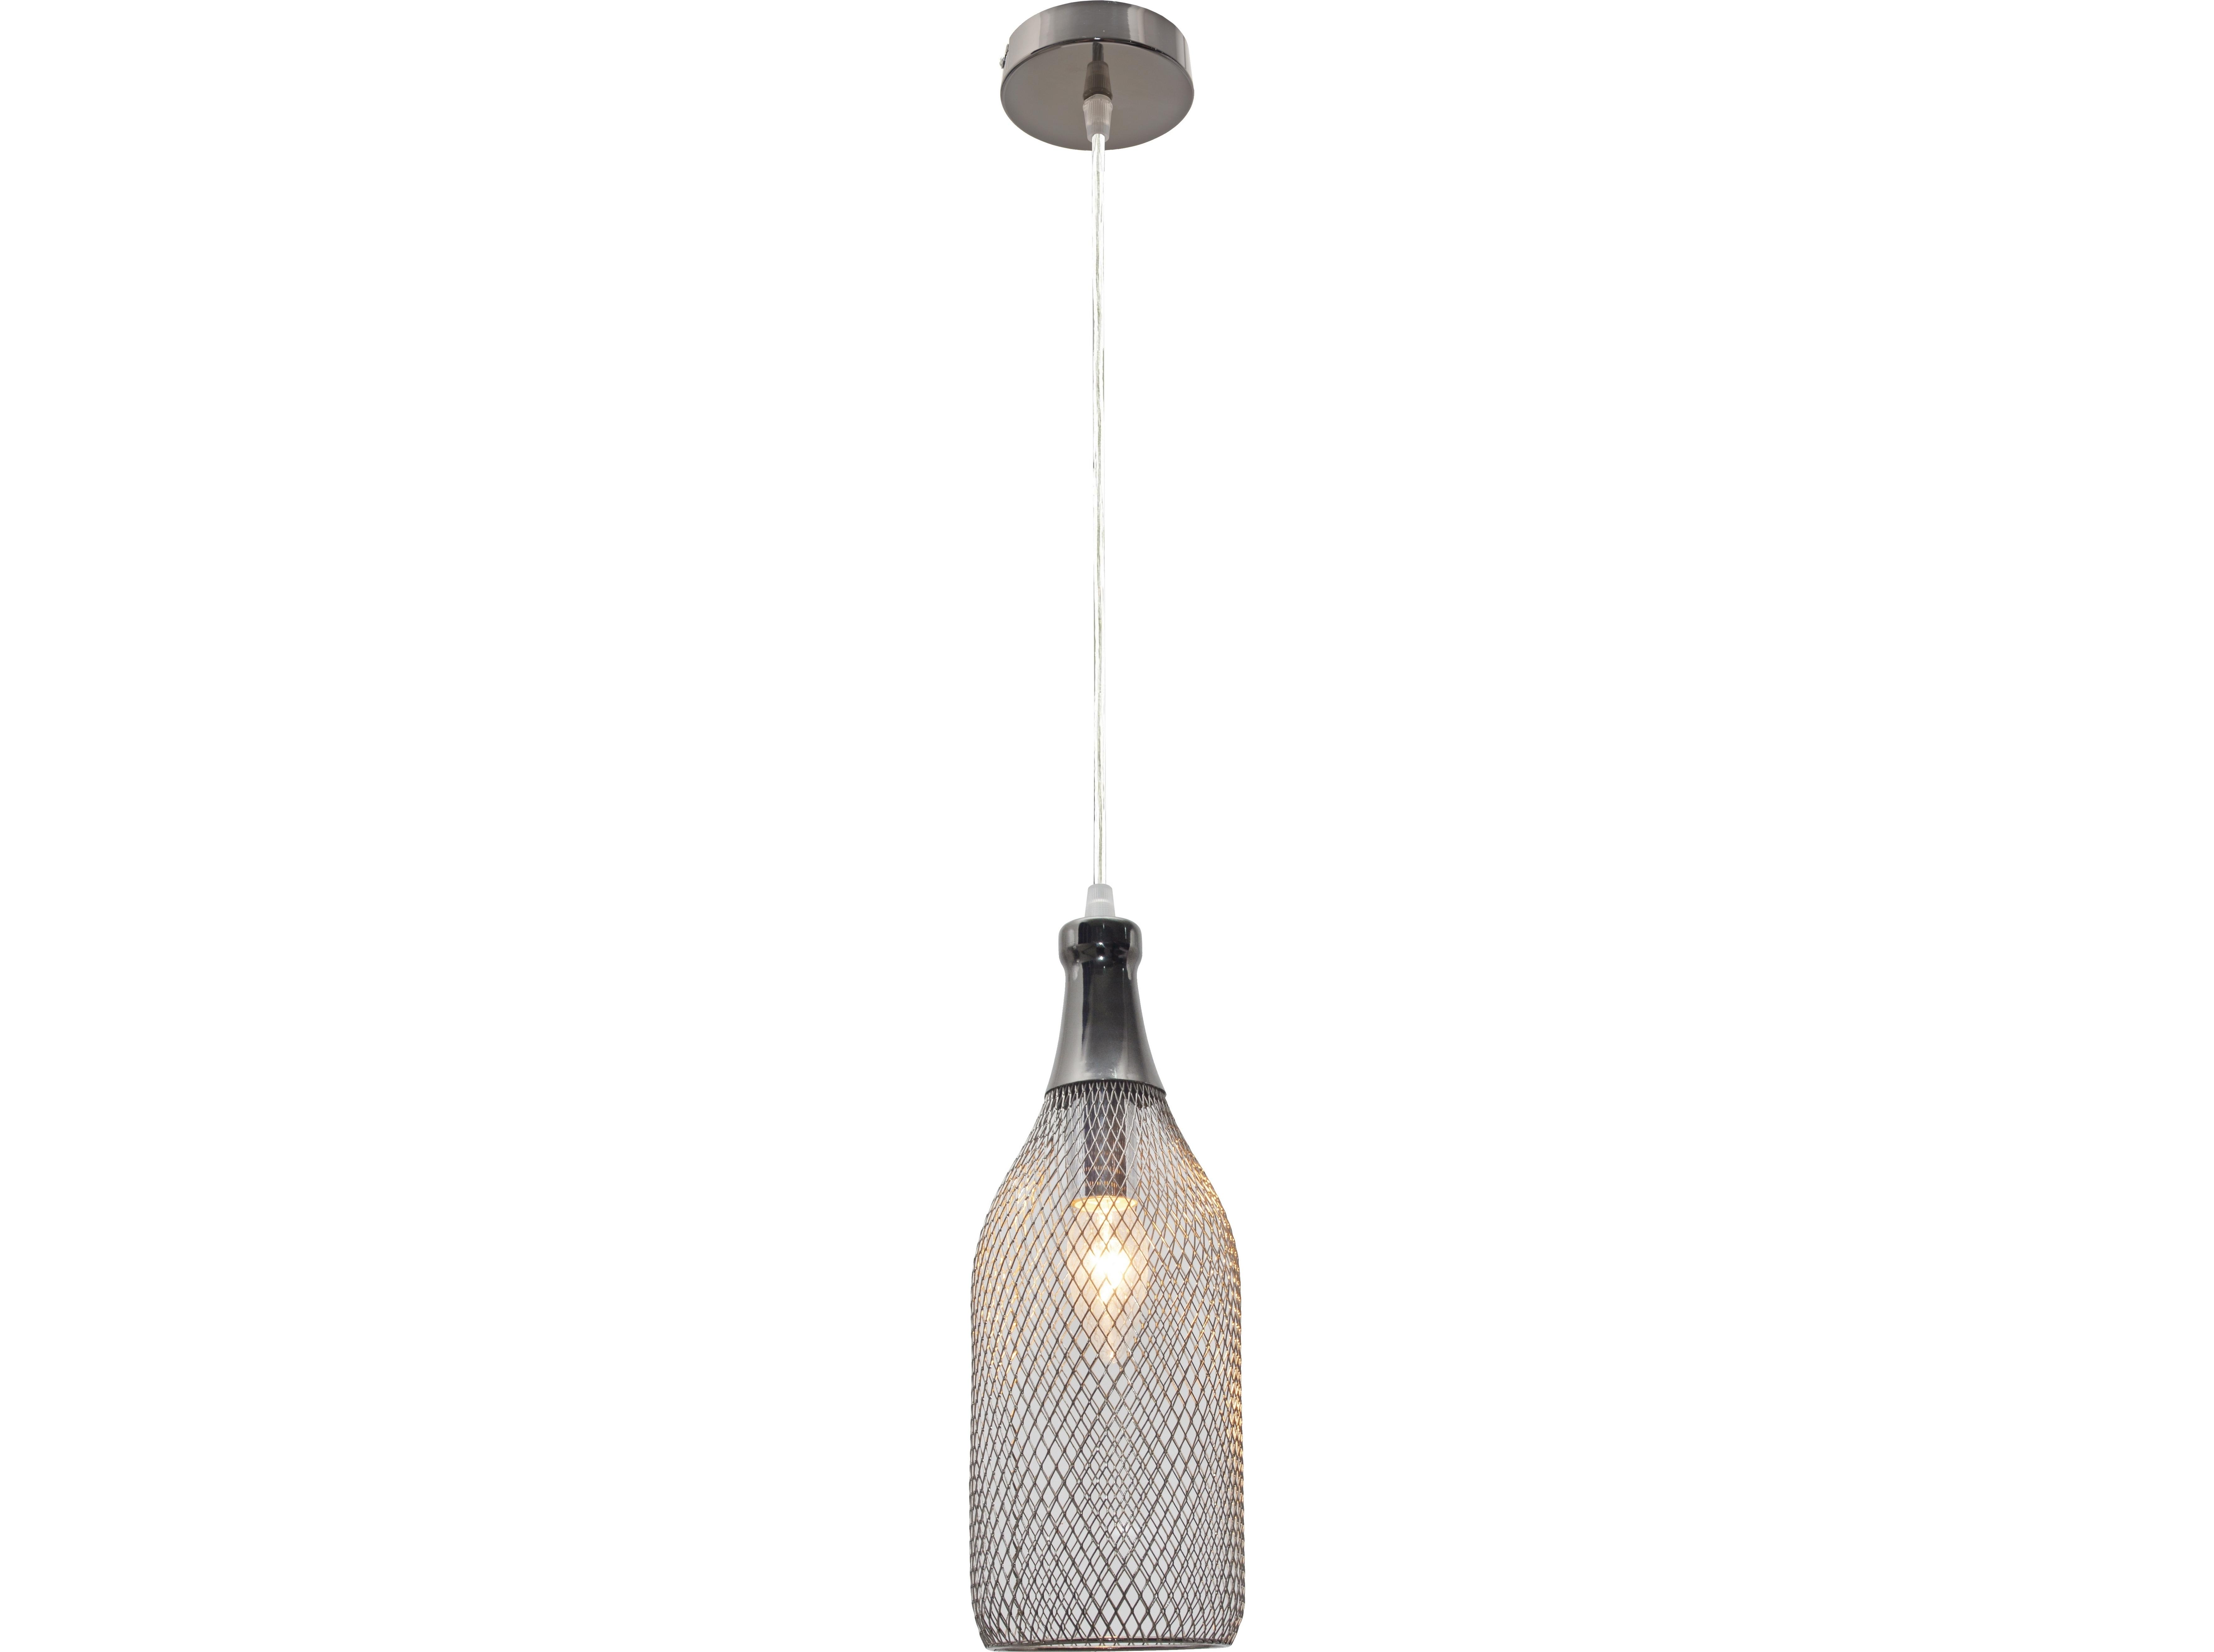 Подвесной светильникПодвесные светильники<br>&amp;lt;div&amp;gt;Цоколь: E14&amp;lt;/div&amp;gt;&amp;lt;div&amp;gt;Мощность ламп: 40W&amp;lt;/div&amp;gt;&amp;lt;div&amp;gt;Количество лампочек: 1&amp;lt;/div&amp;gt;<br><br>Material: Металл<br>Width см: None<br>Height см: 120<br>Diameter см: 14